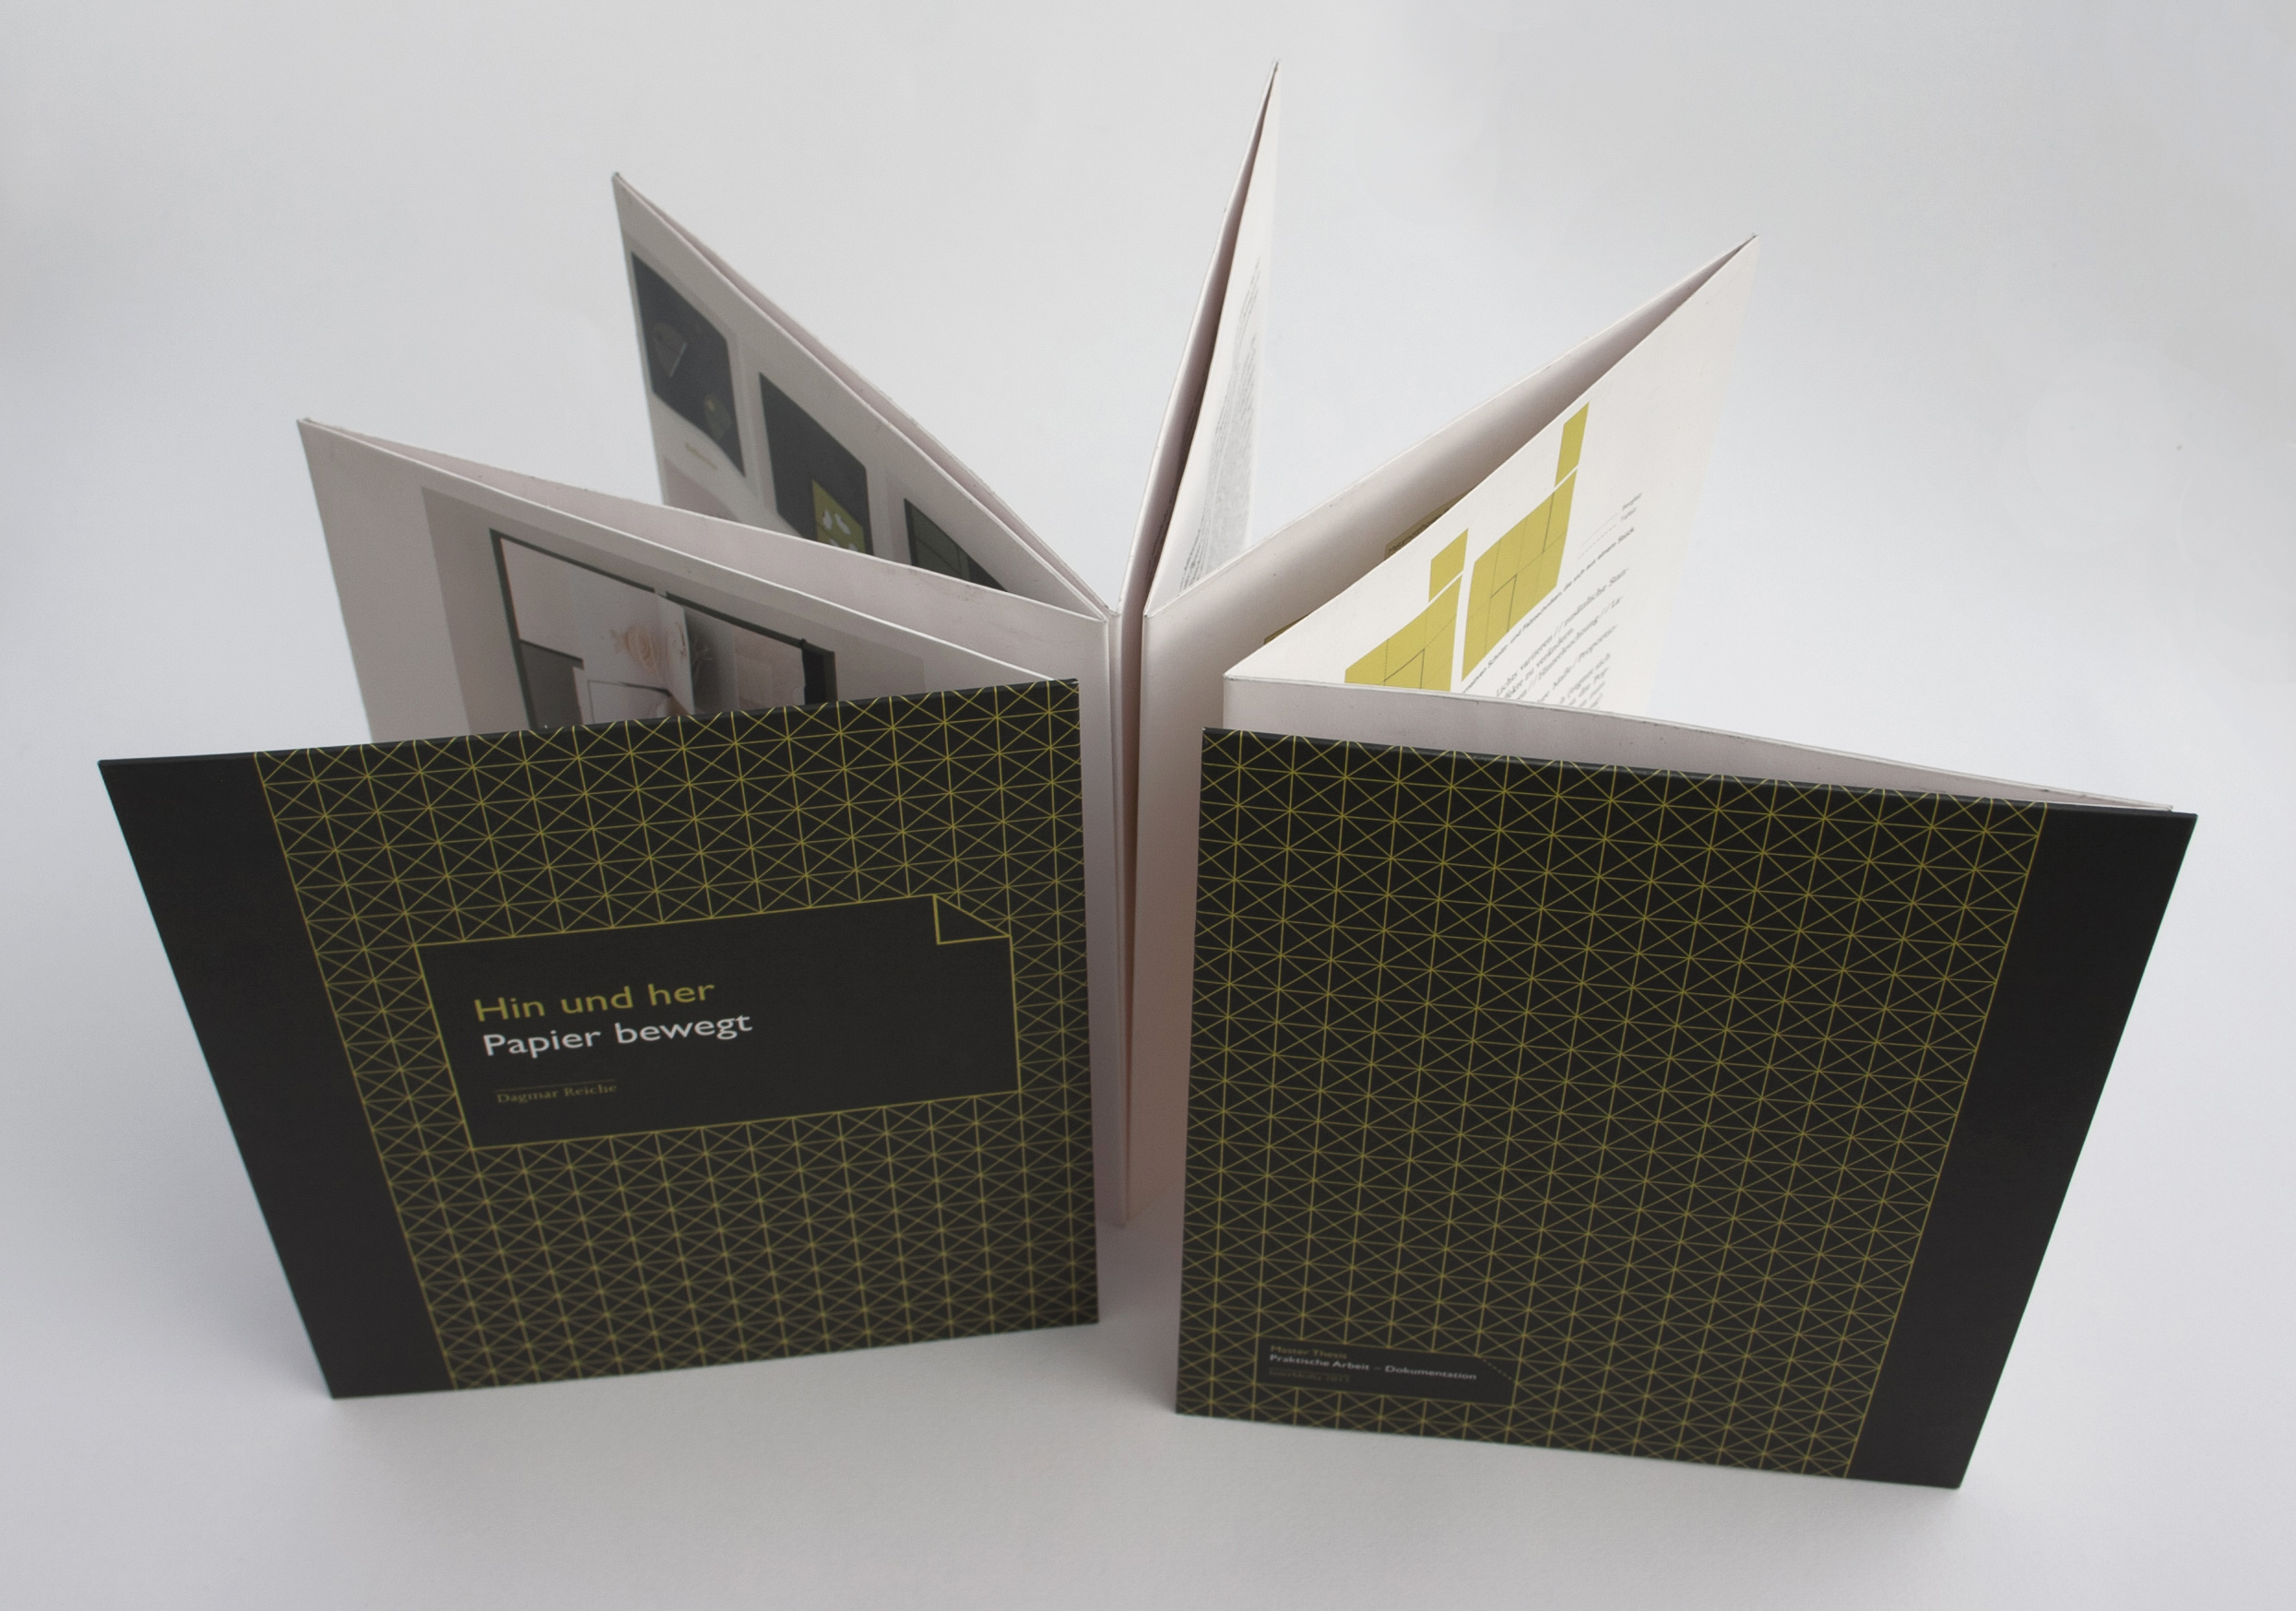 download Polymer Composites for Civil